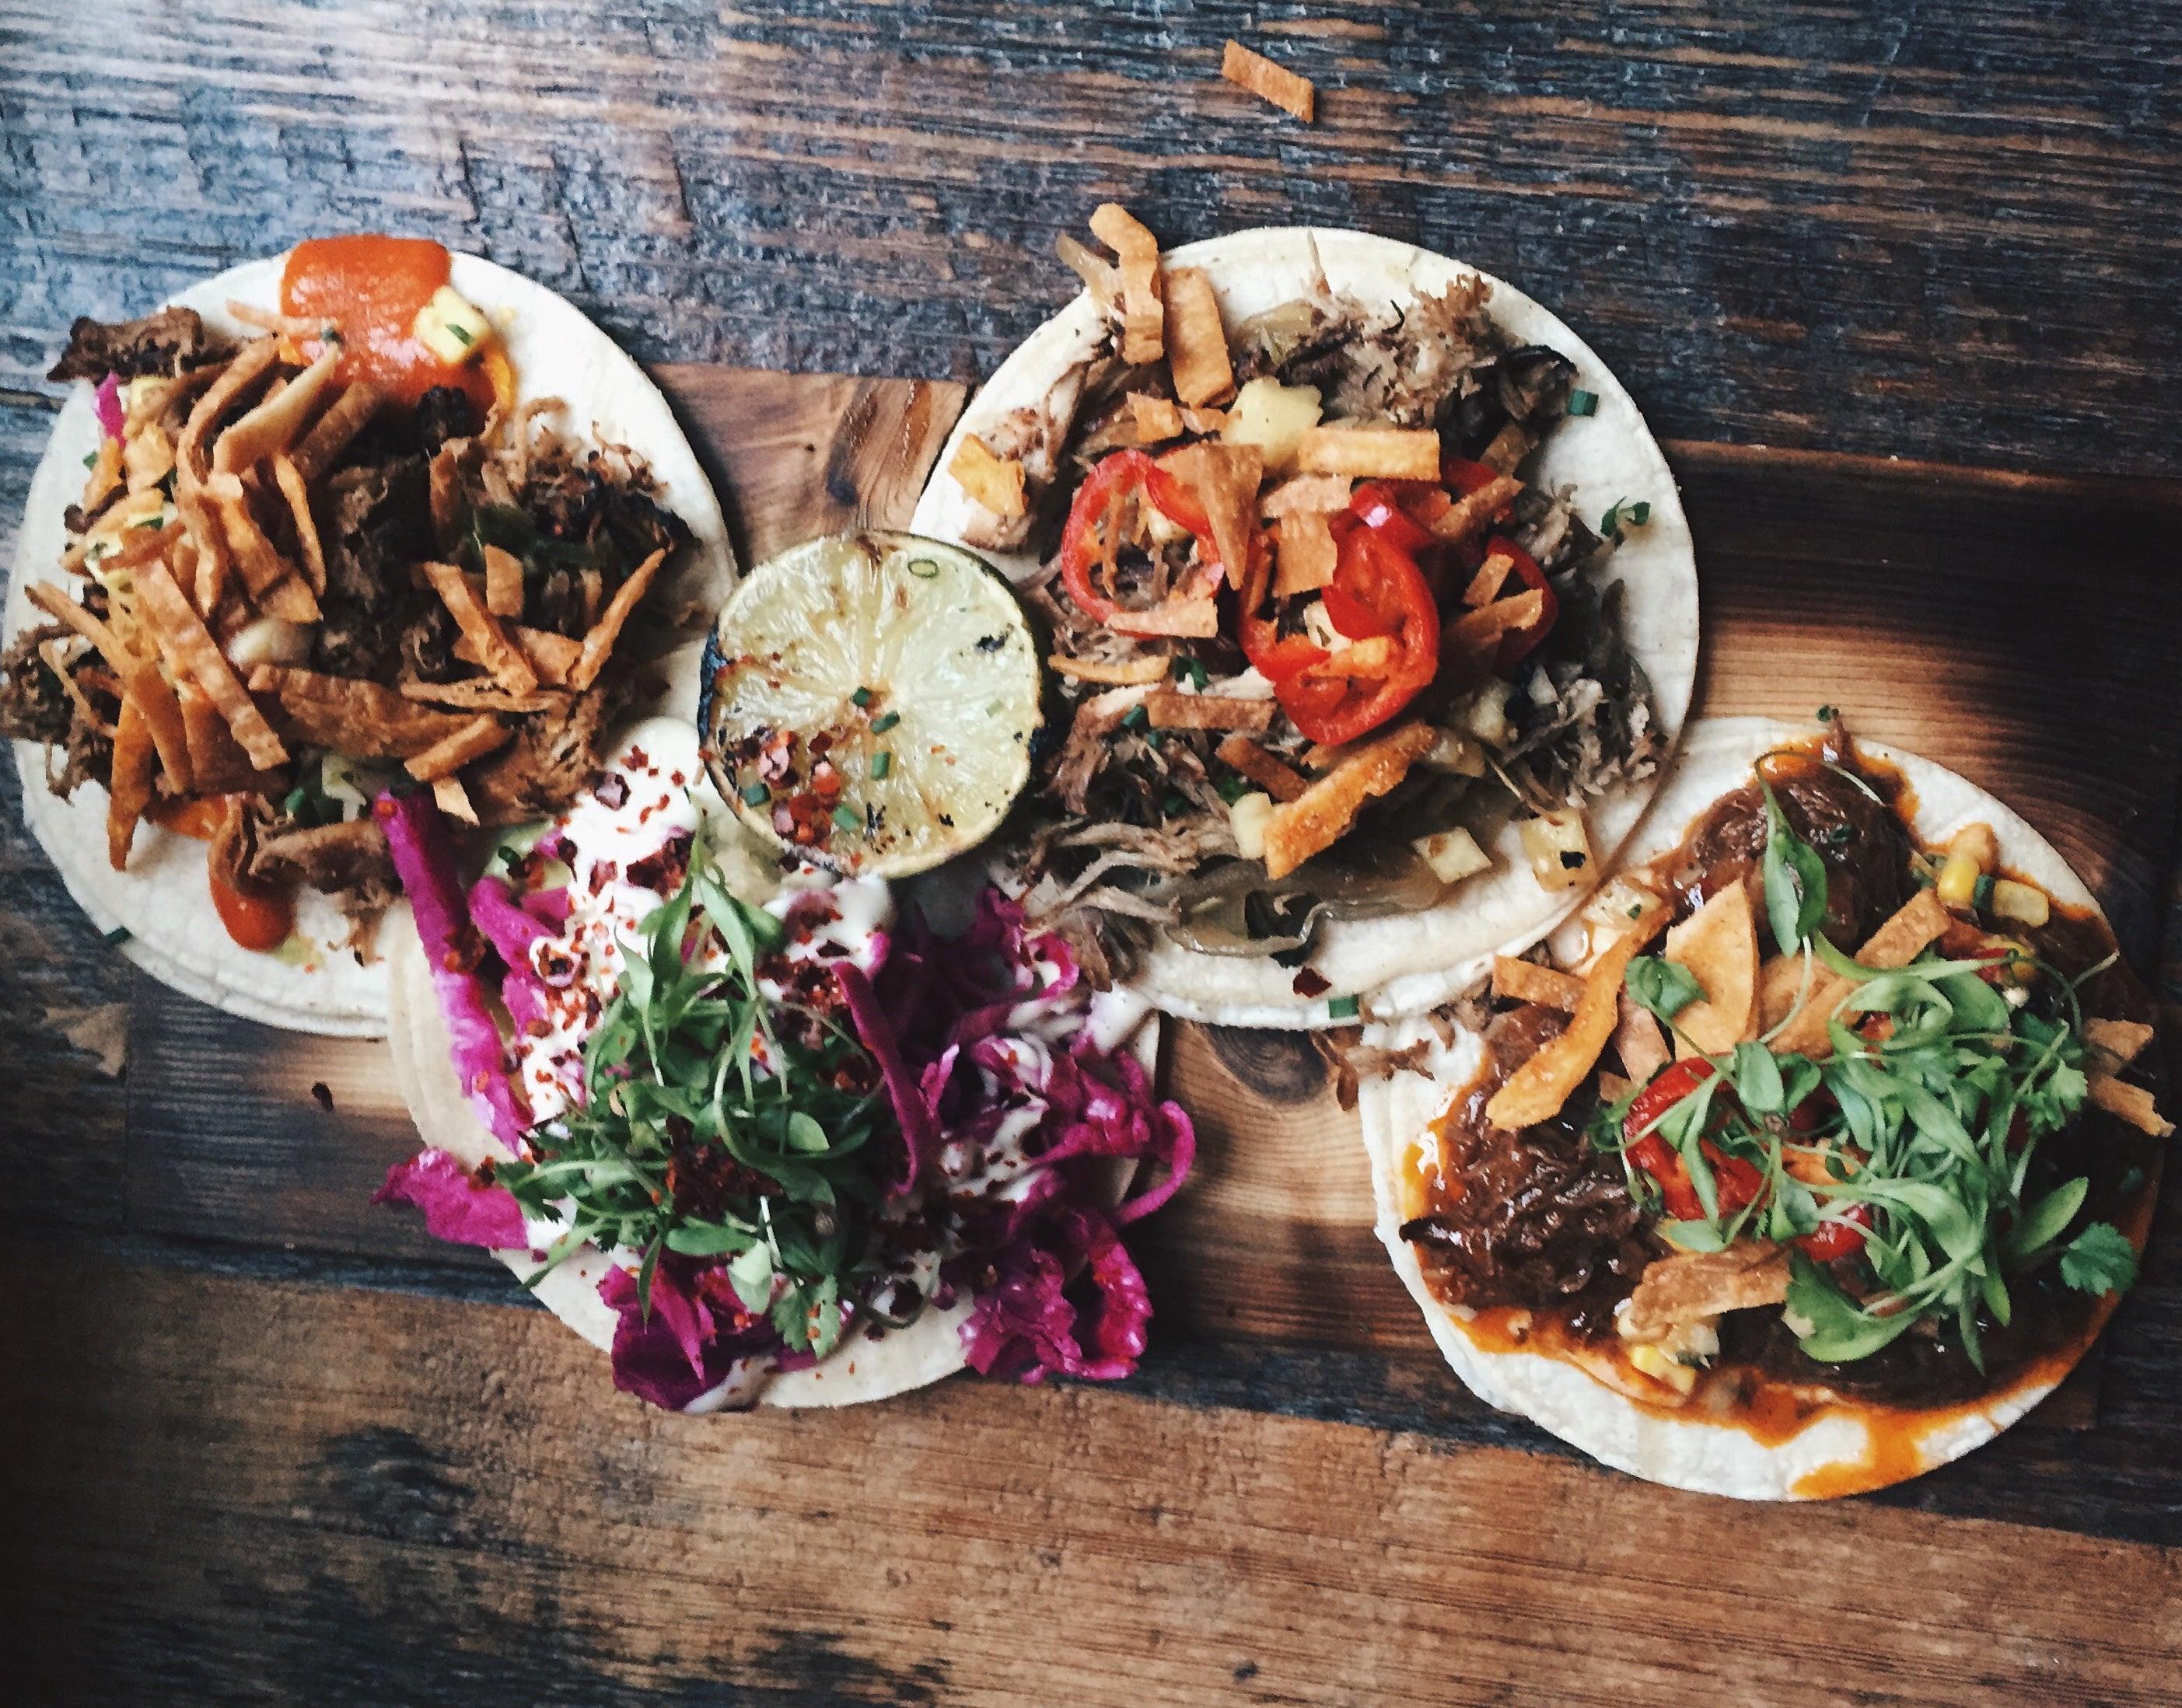 Tacos at Loco Taqueria & Oyster Bar.